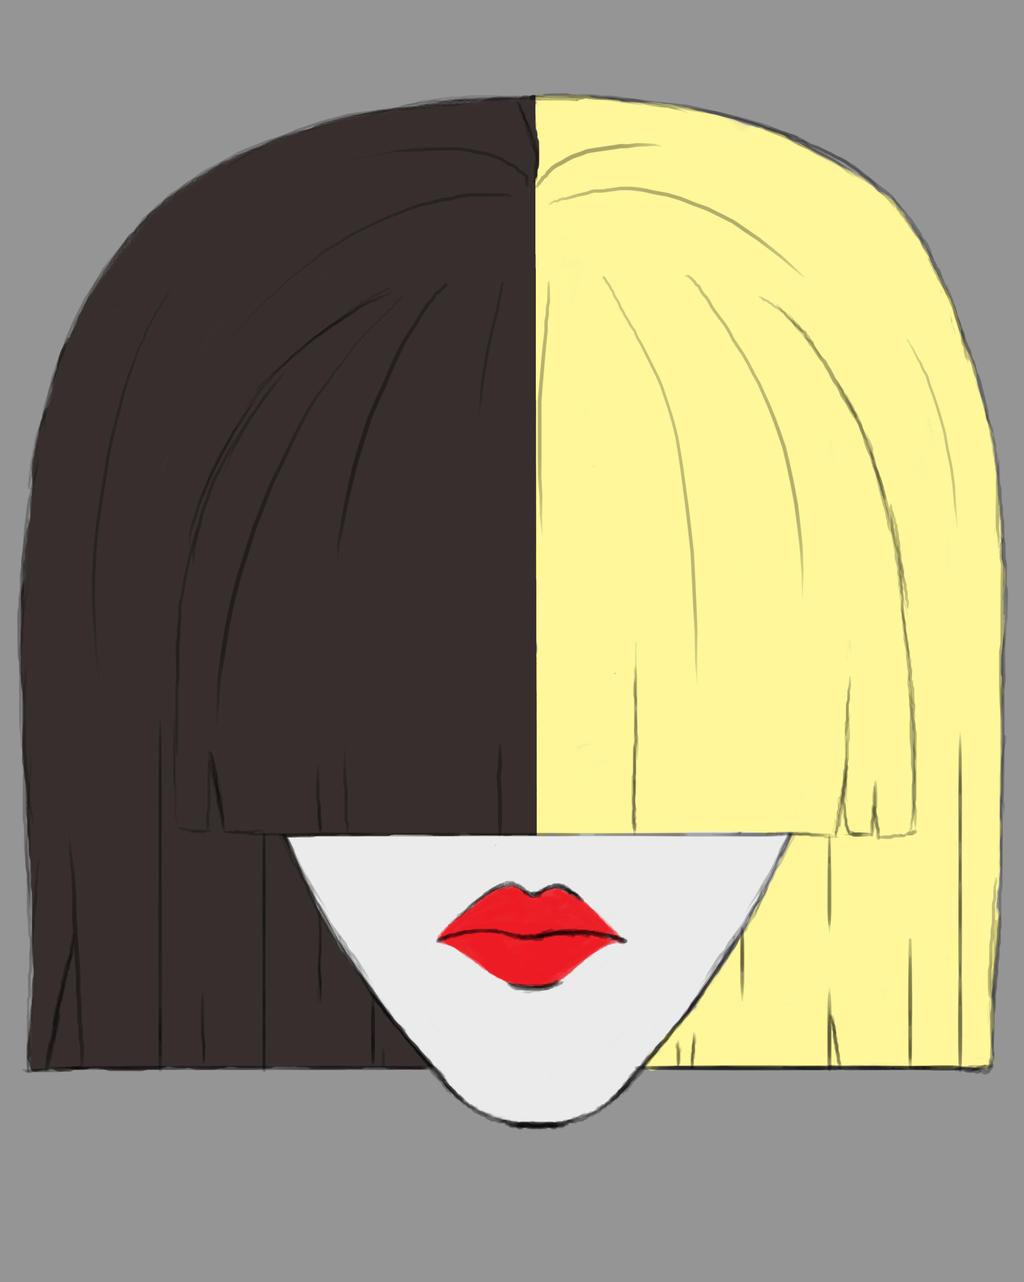 Sia Daily sketch #672 by GothicVampireFreak